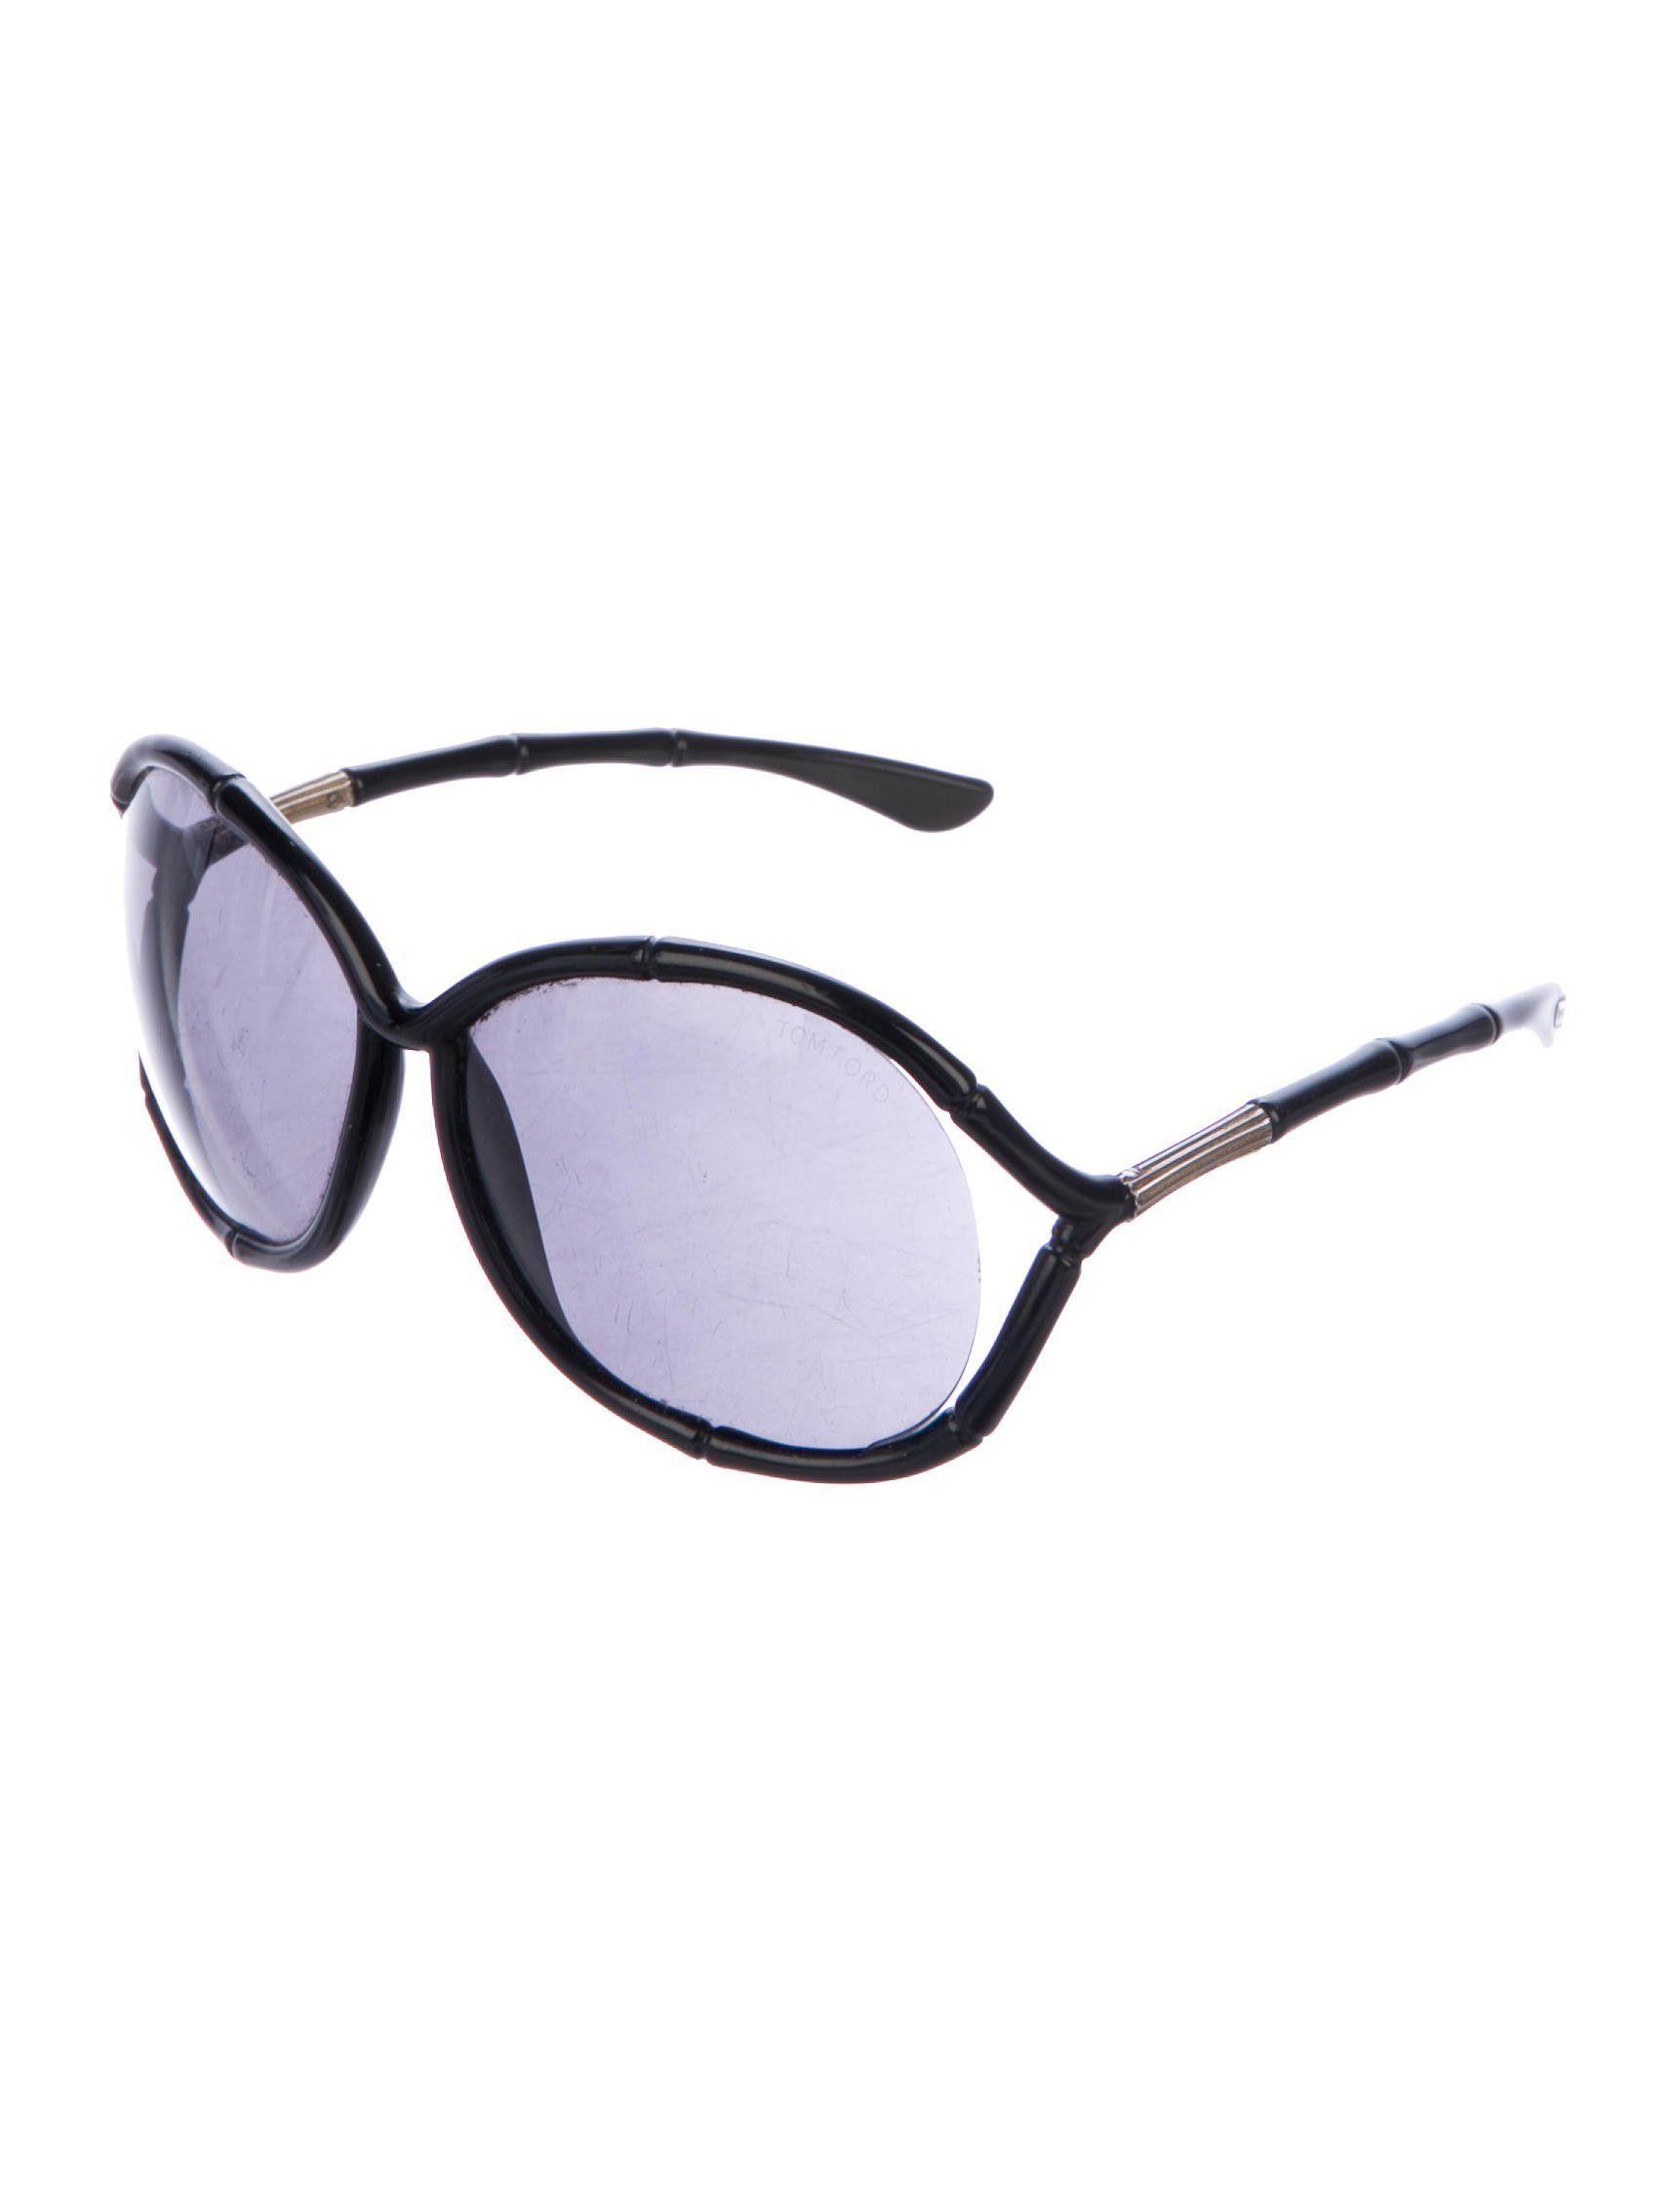 3d0323fbe7d Black acetate Tom Ford Claudia oversize sunglasses with black lenses